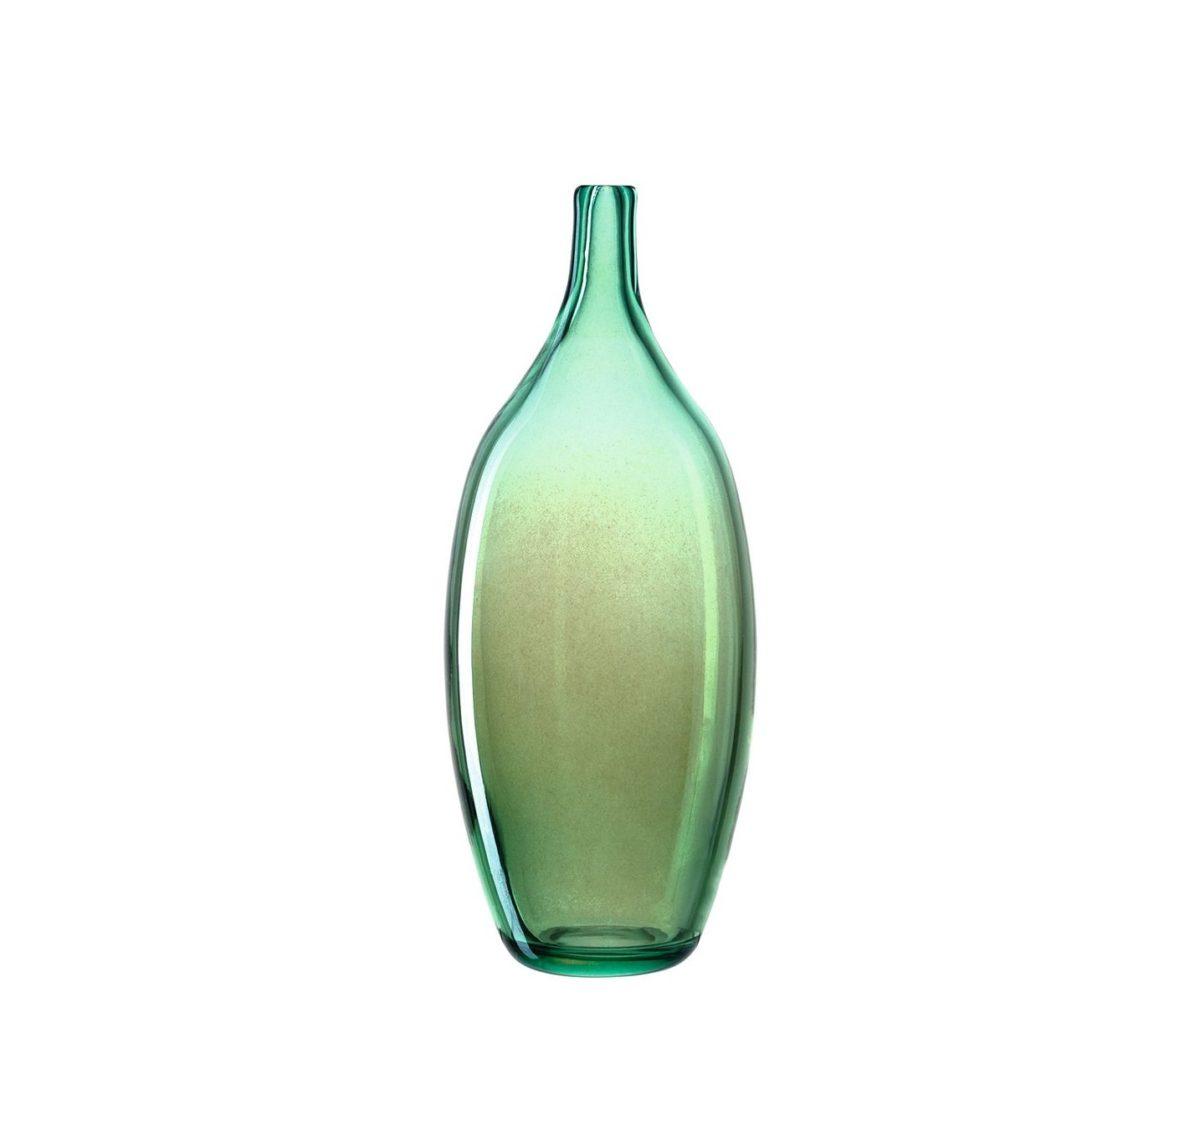 020813 0 k 1 1200x1146 - Vază luster Lucente green 32 cm (L020813)